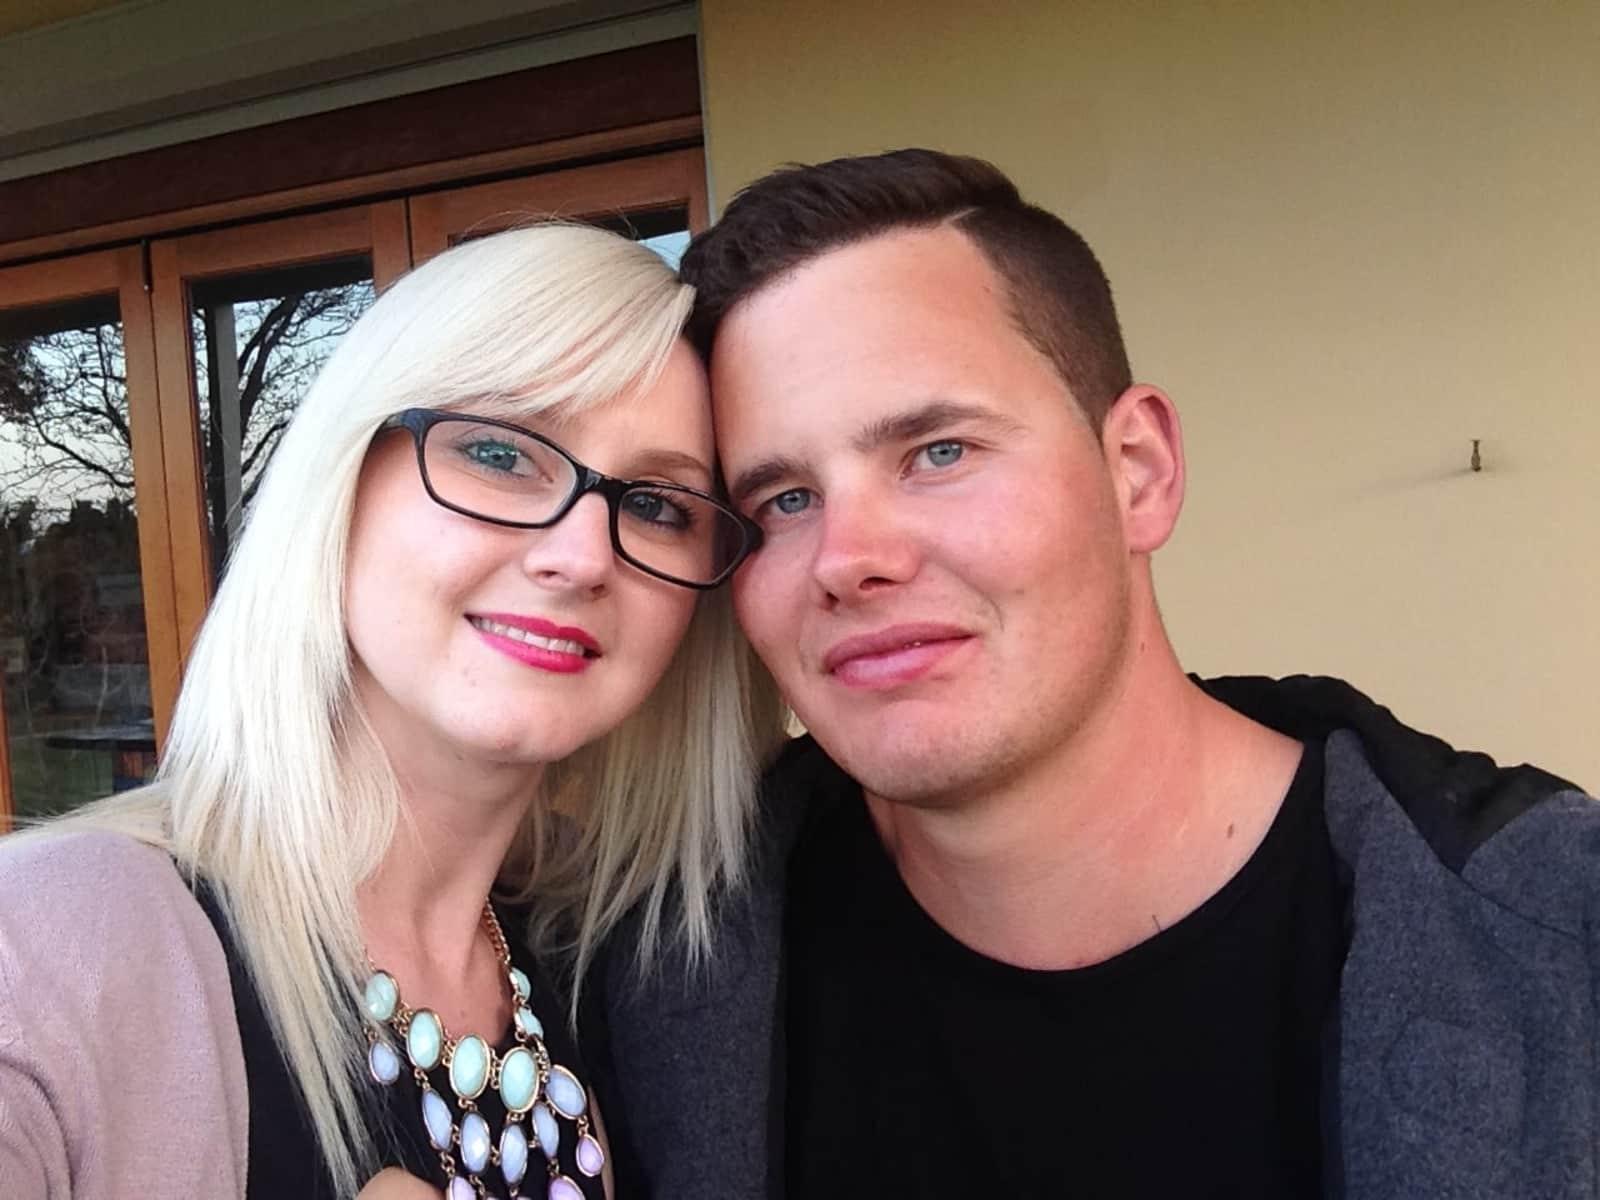 Lee & Rebekah from Kiama, New South Wales, Australia